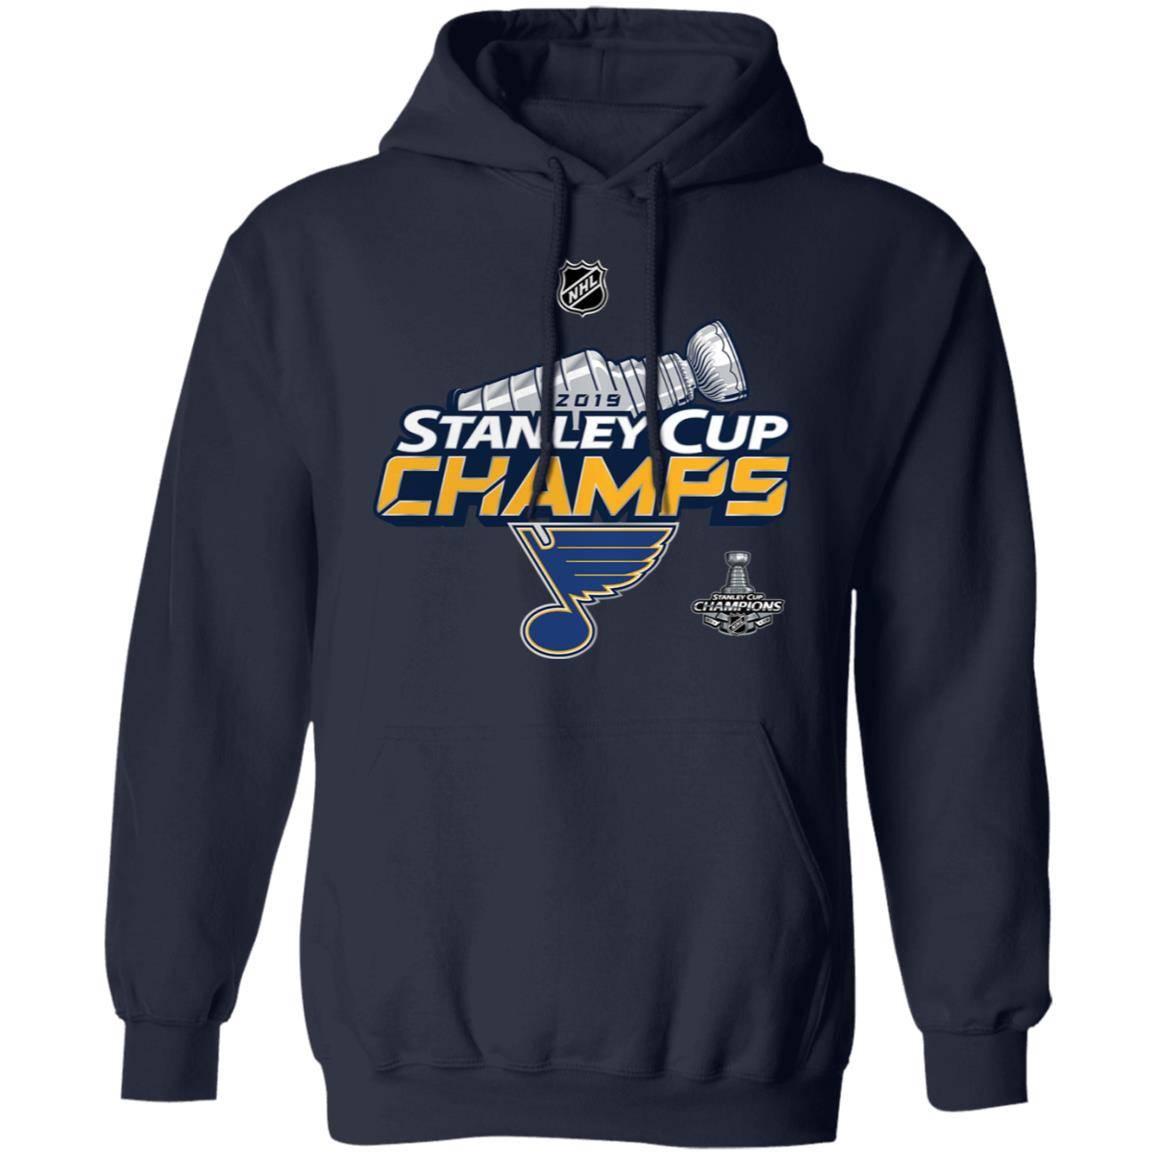 St Louis Blues Stanley Cup Champions 2019 – Hoodie for Men, Women